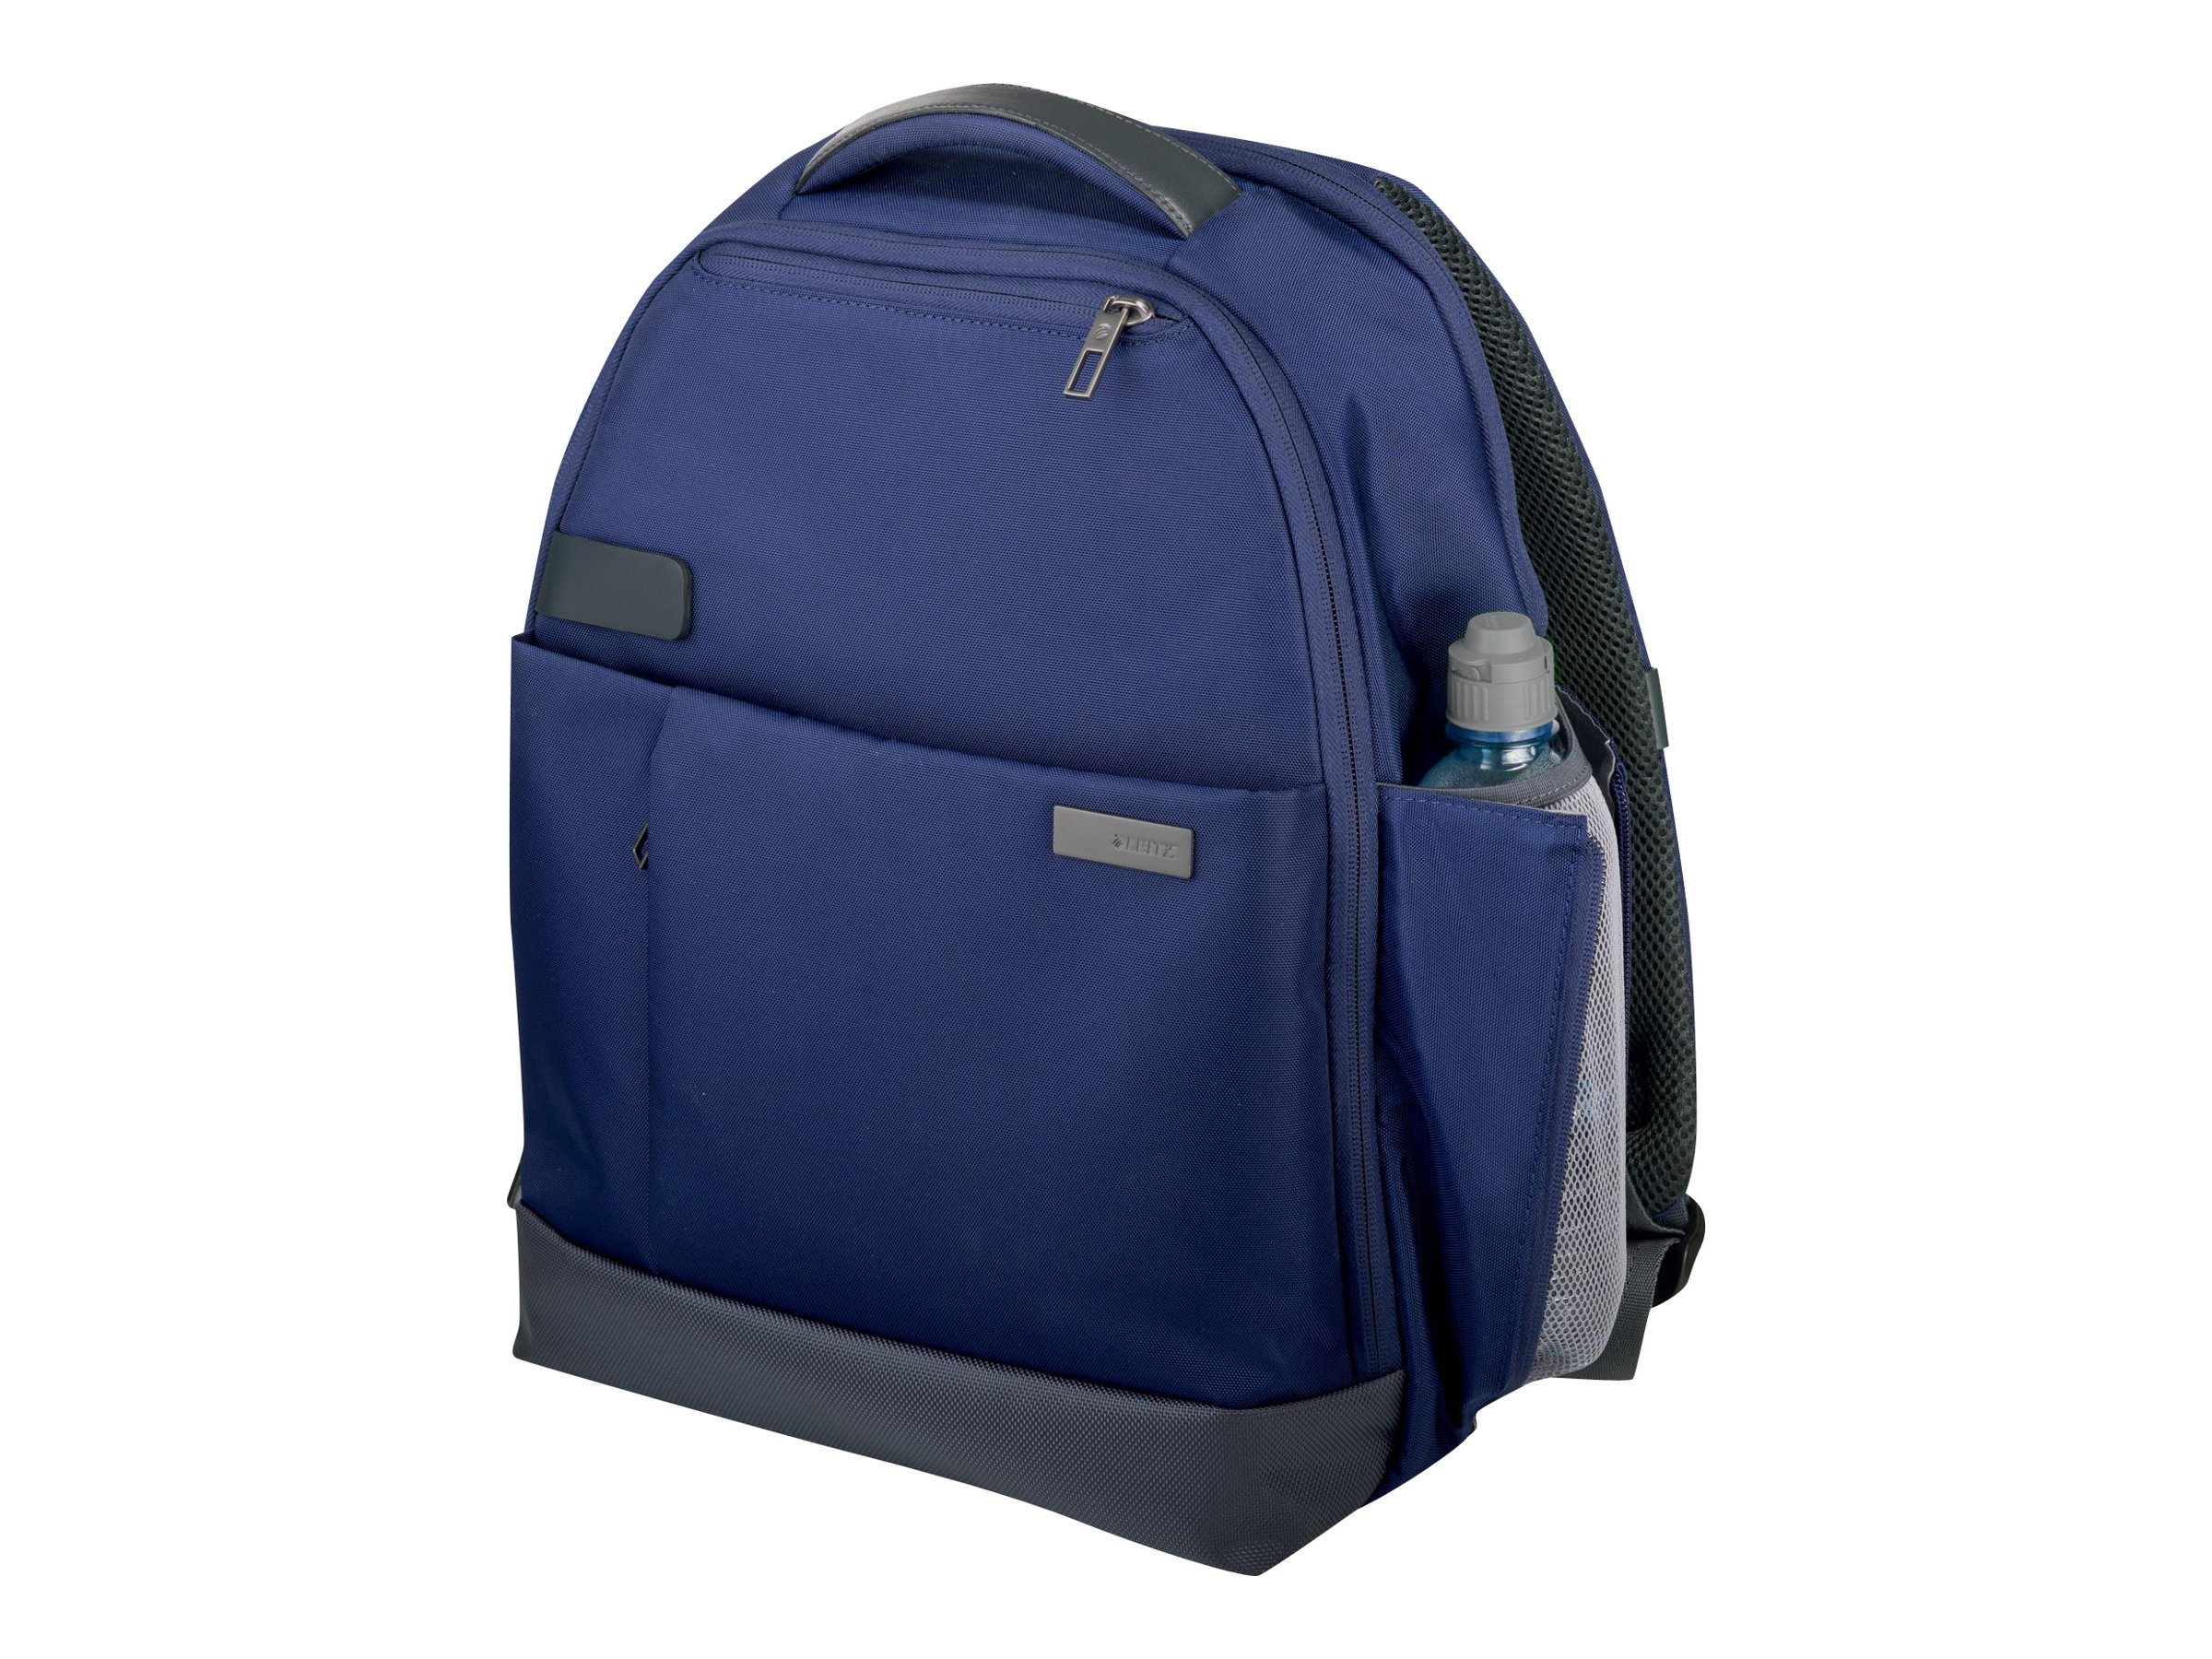 Leitz Complete Smart Traveller - Notebook-Rucksack - 33.8 cm (13.3